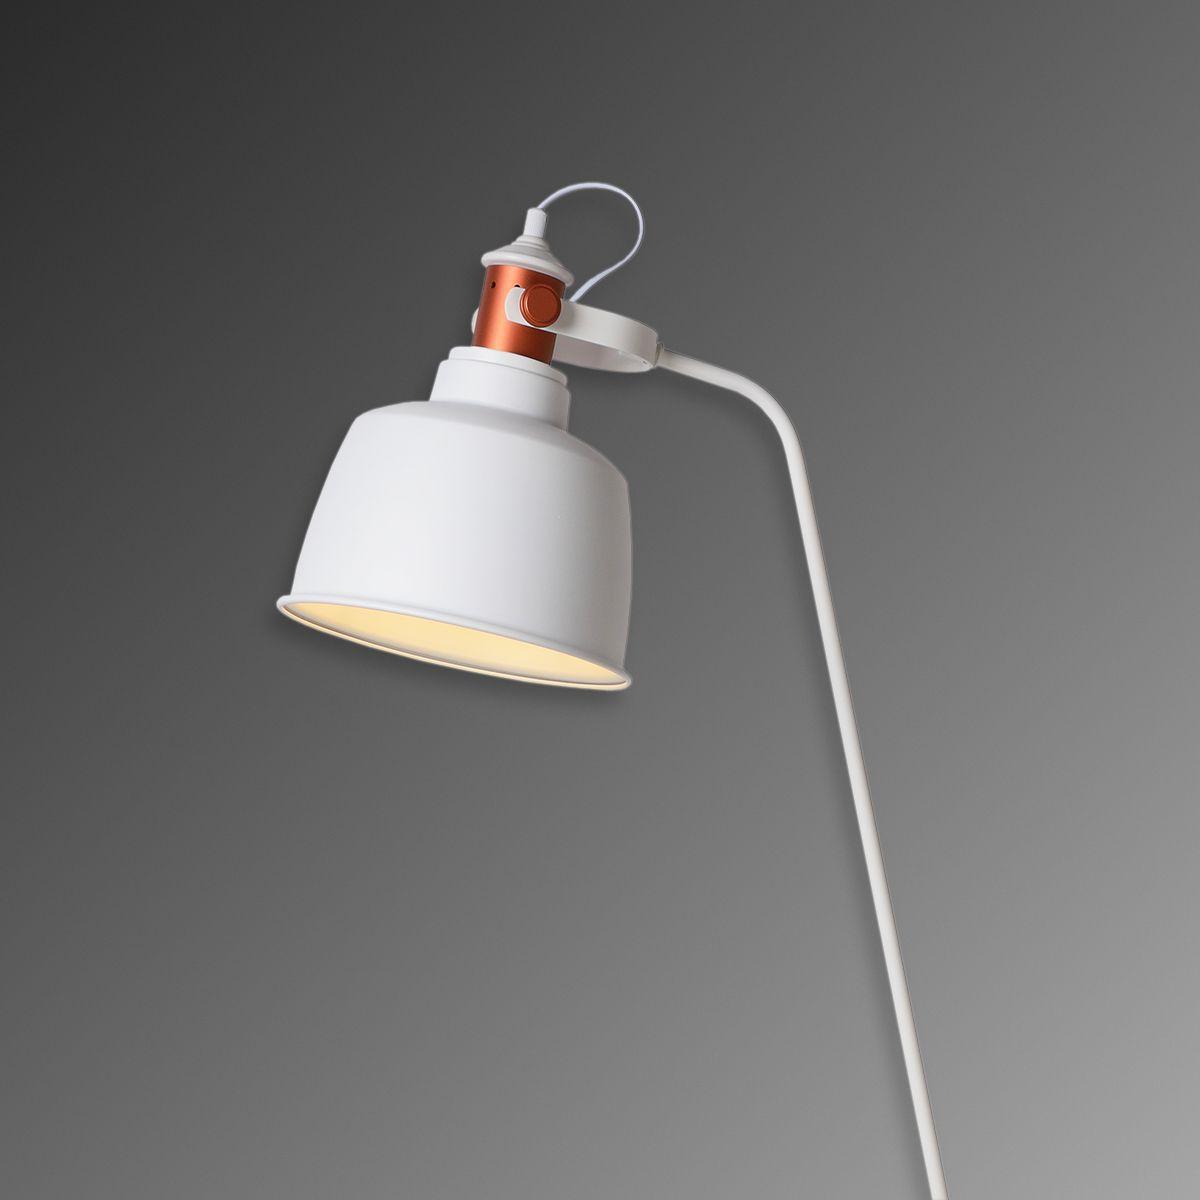 Trendige Stehlampe Tjoll Im Industrie Design Jetzt Bestellen Unter:  Https://moebel